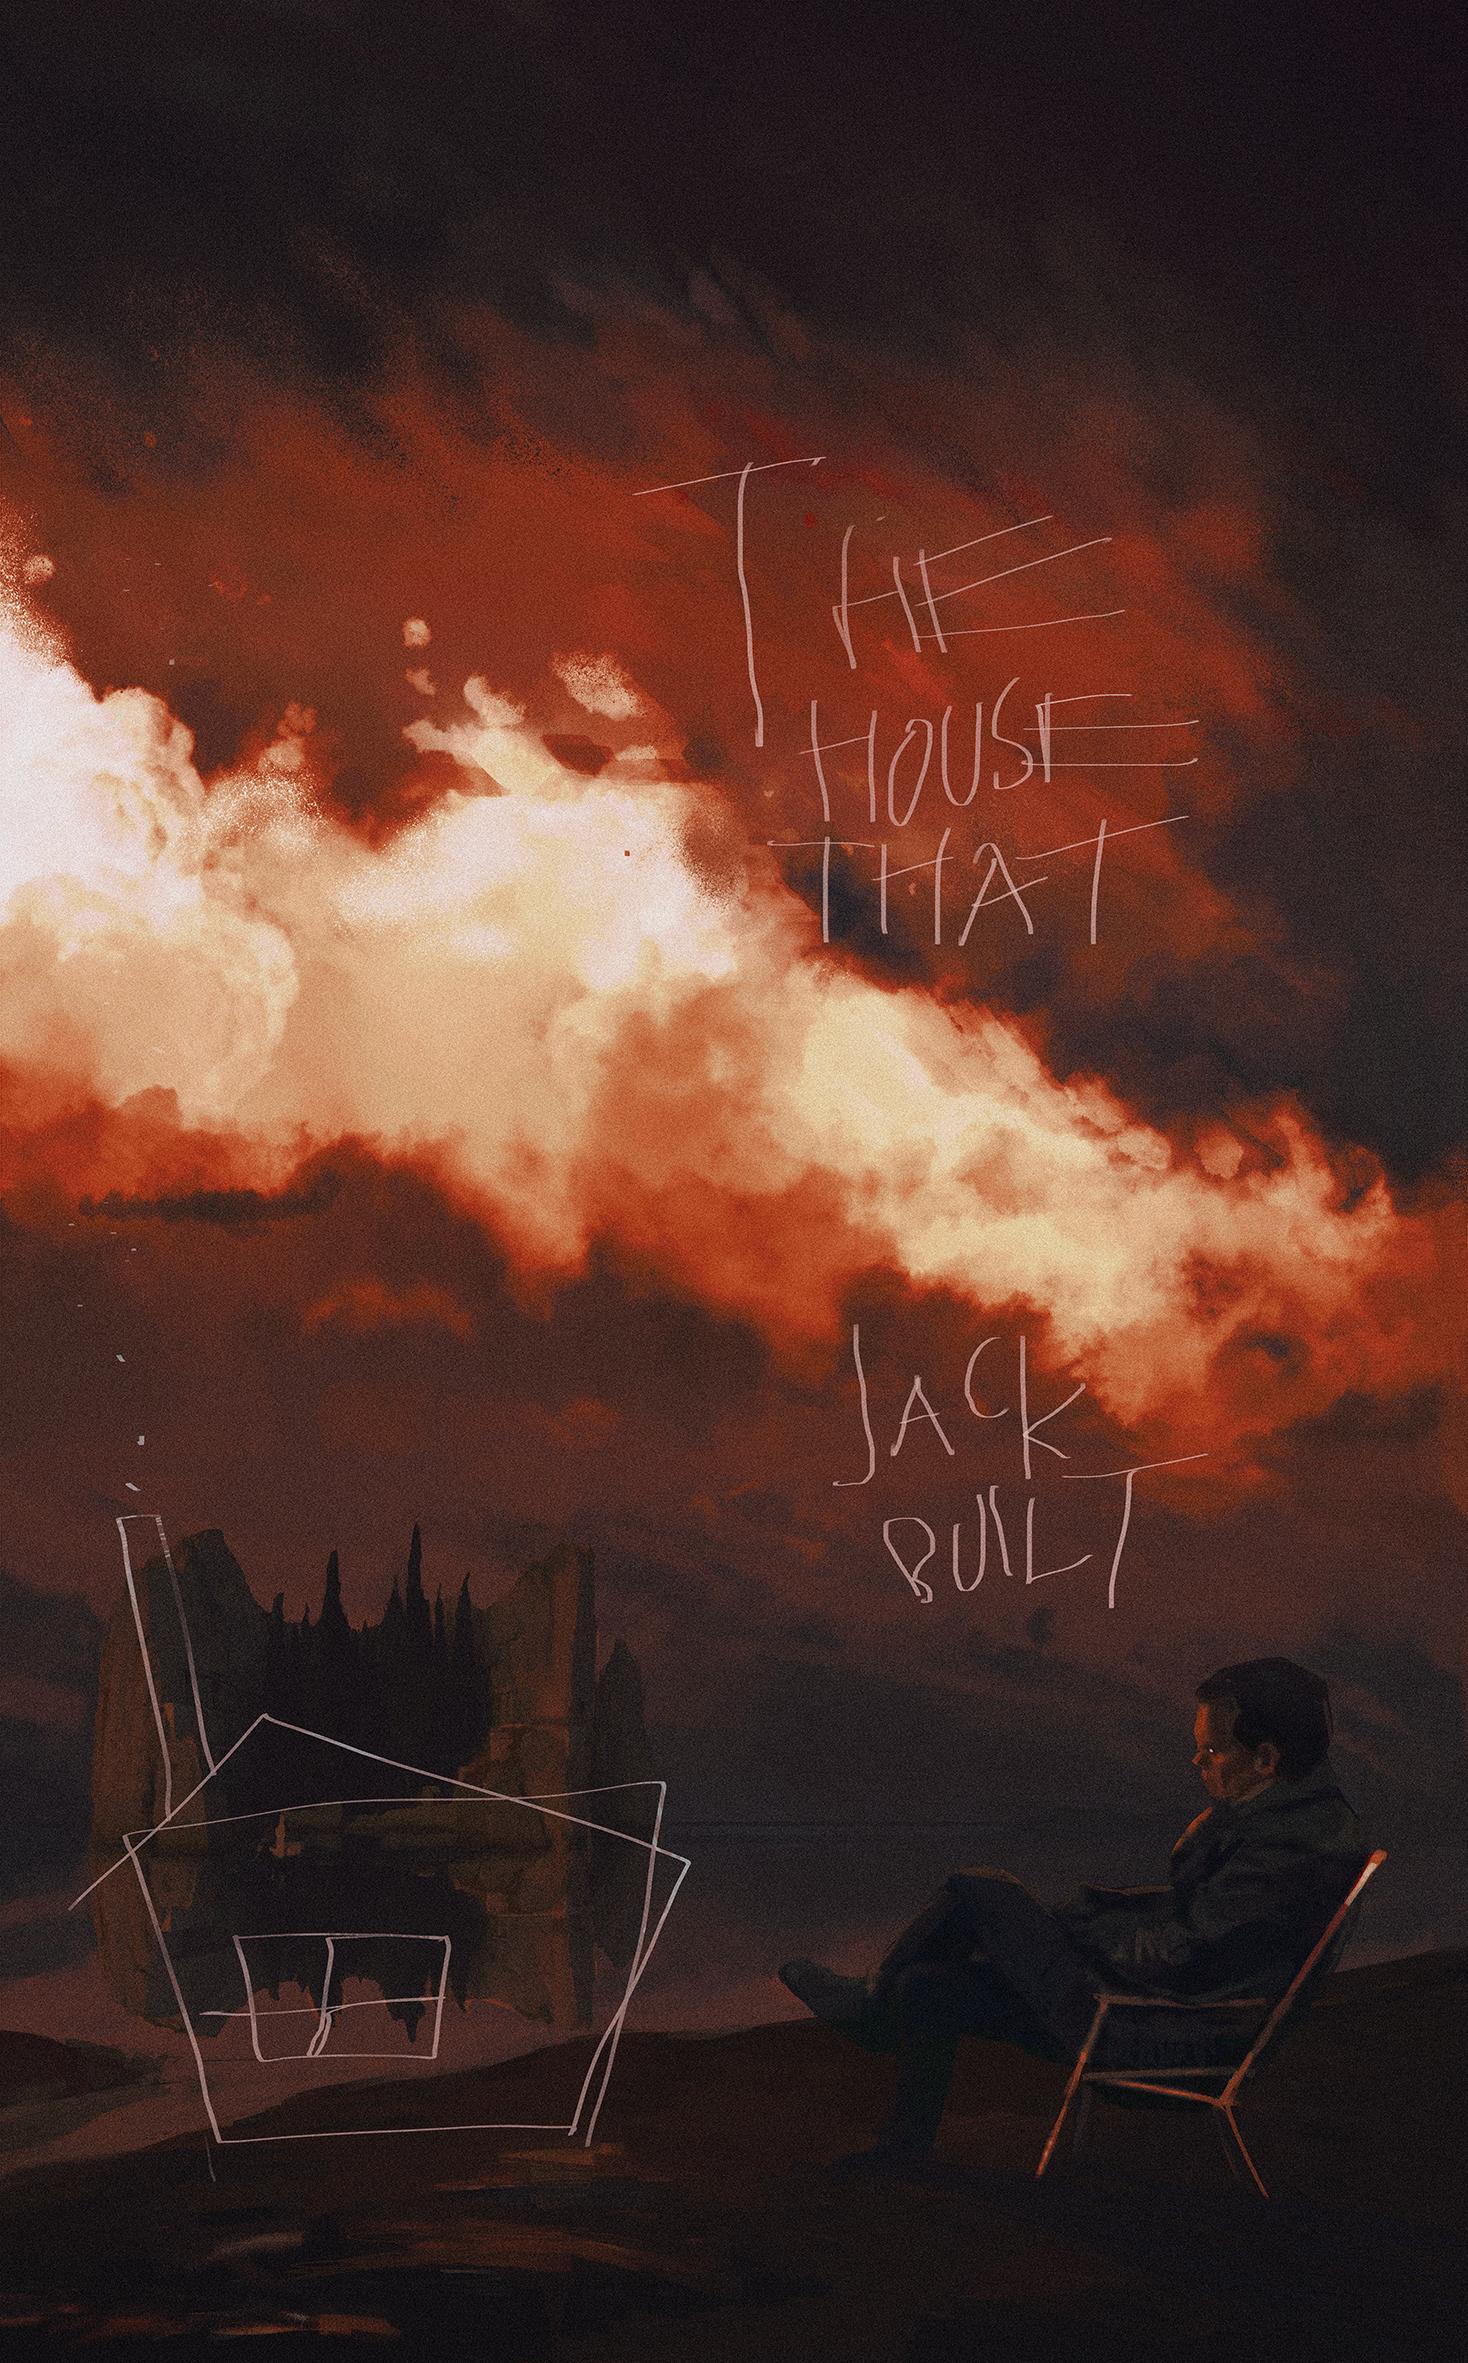 The House That Jack Built 2018 1468 X 2363 Movie Illustration Alternative Movie Posters Horror Illustration